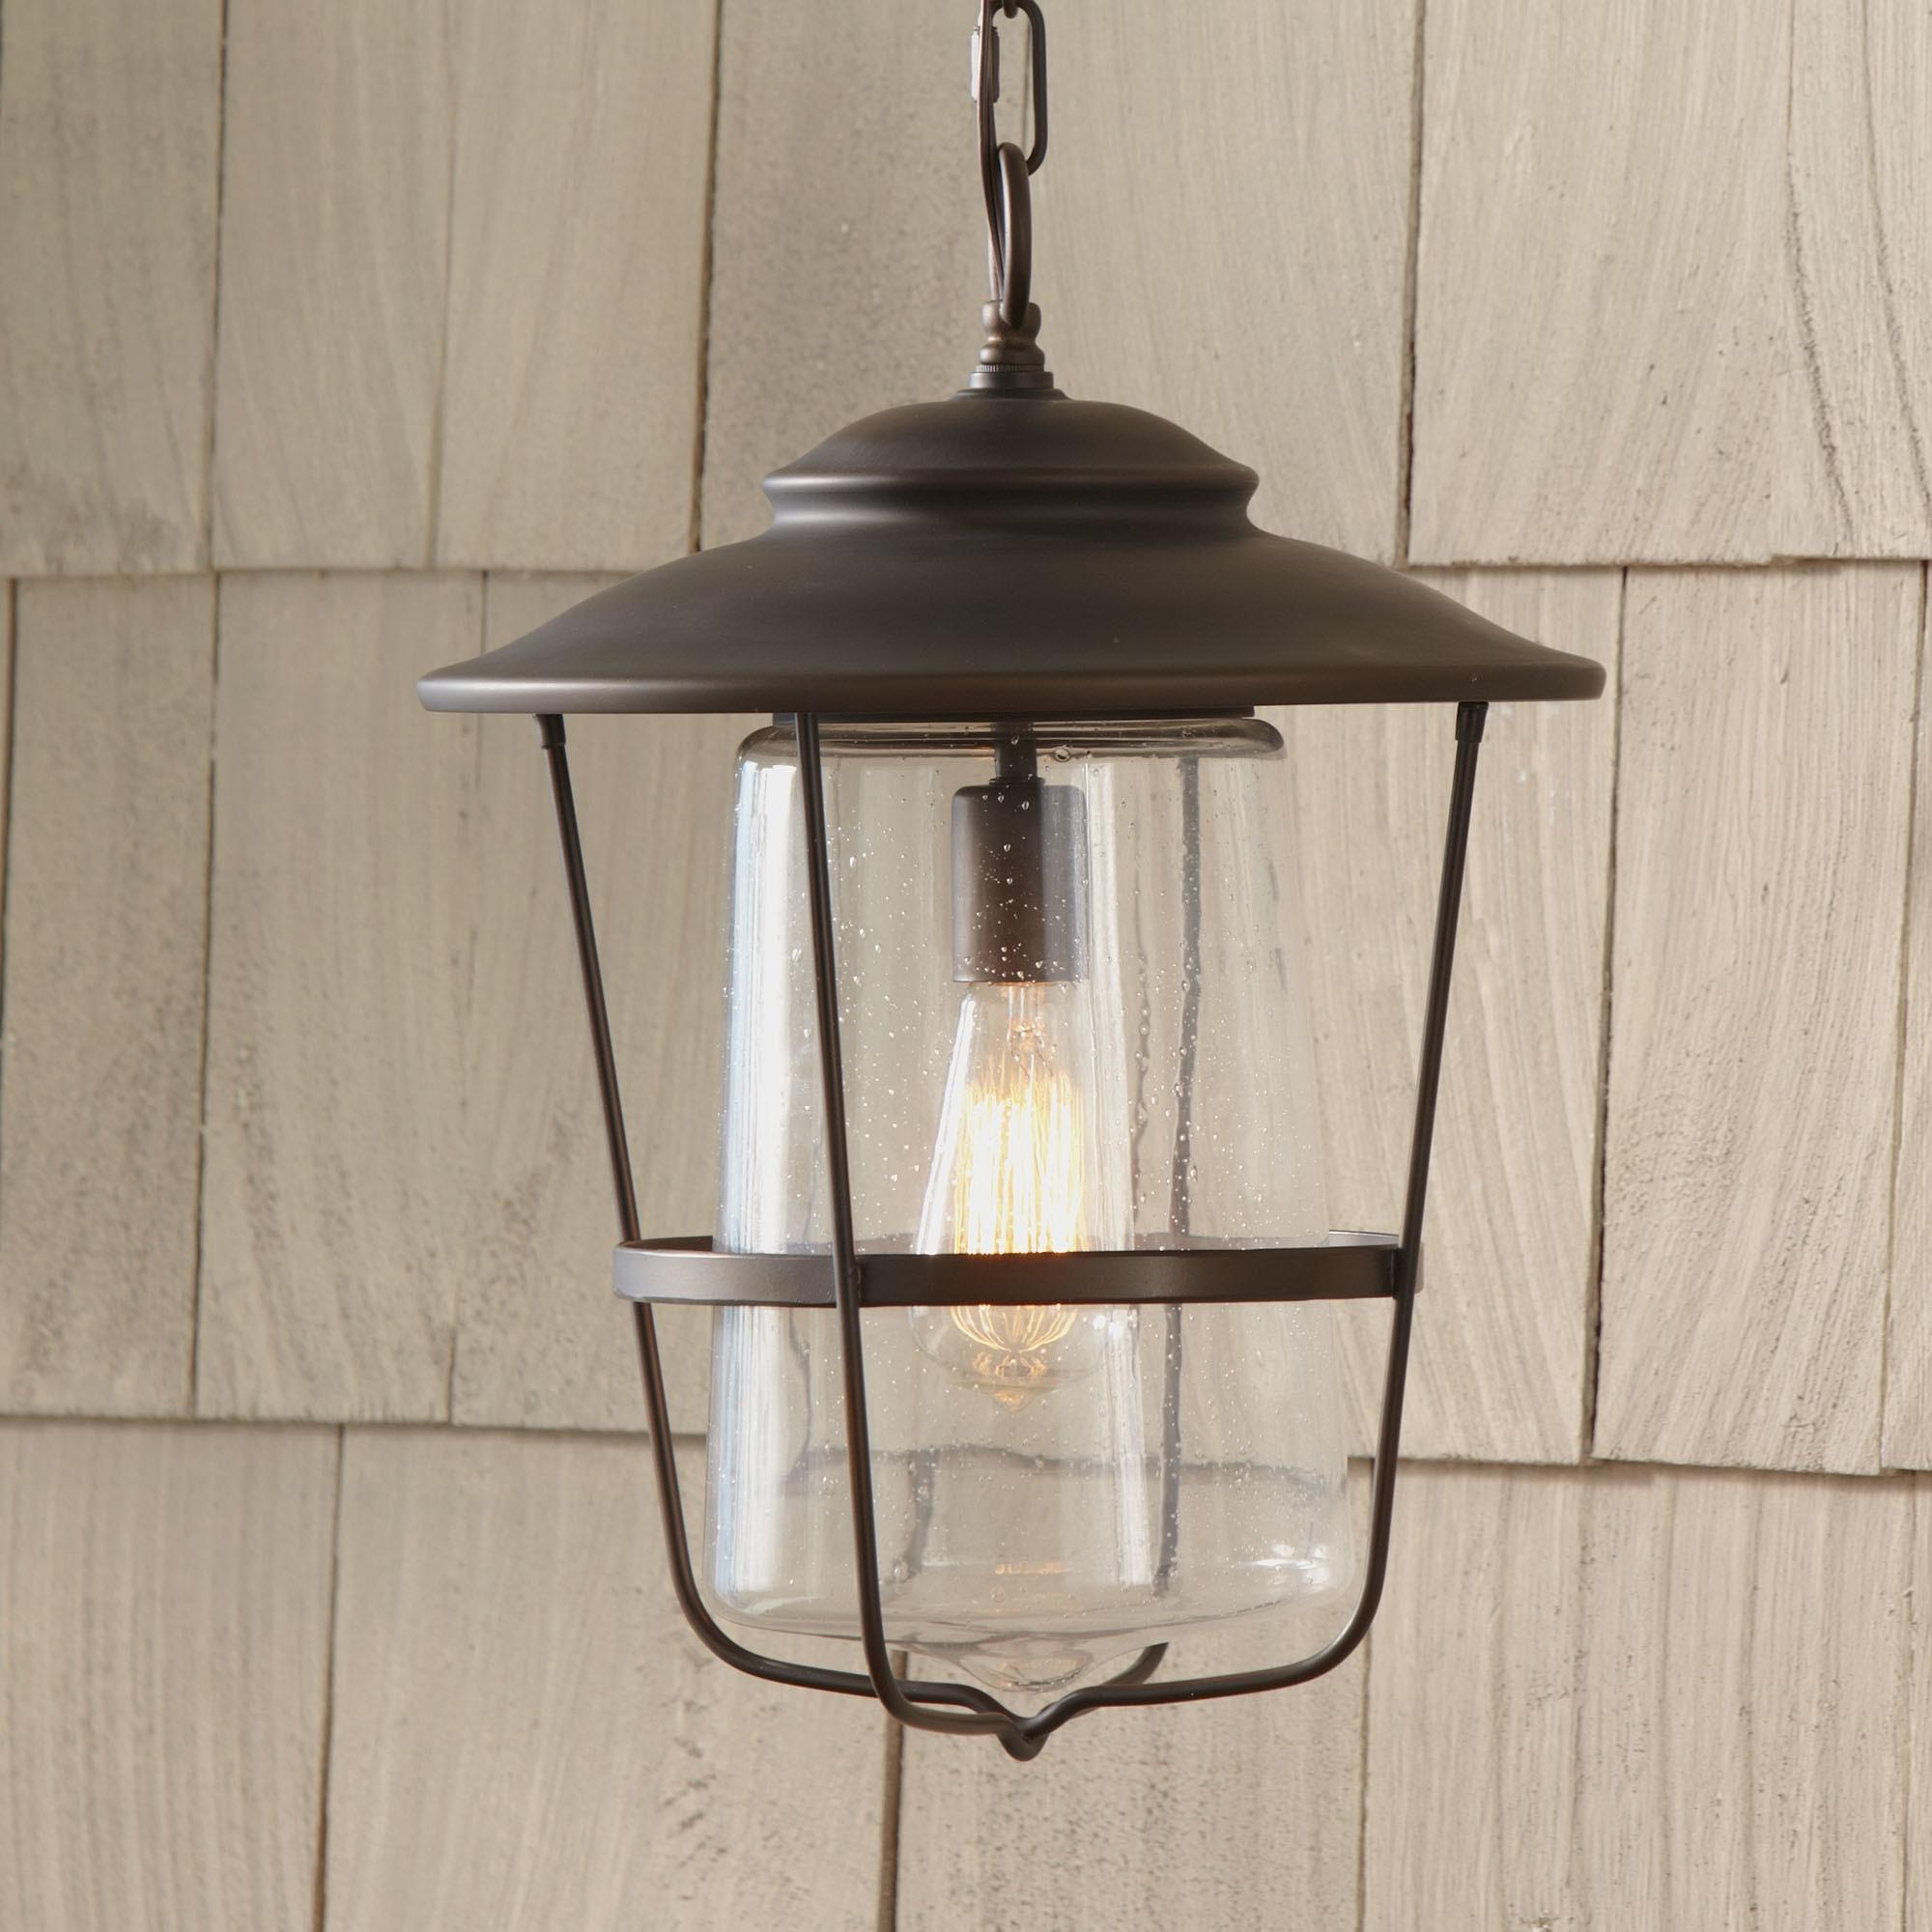 Best And Newest Outdoor Hanging Lights Wayfair Remington Lantern ~ Loversiq Inside Battery Operated Outdoor Lights At Wayfair (View 5 of 20)